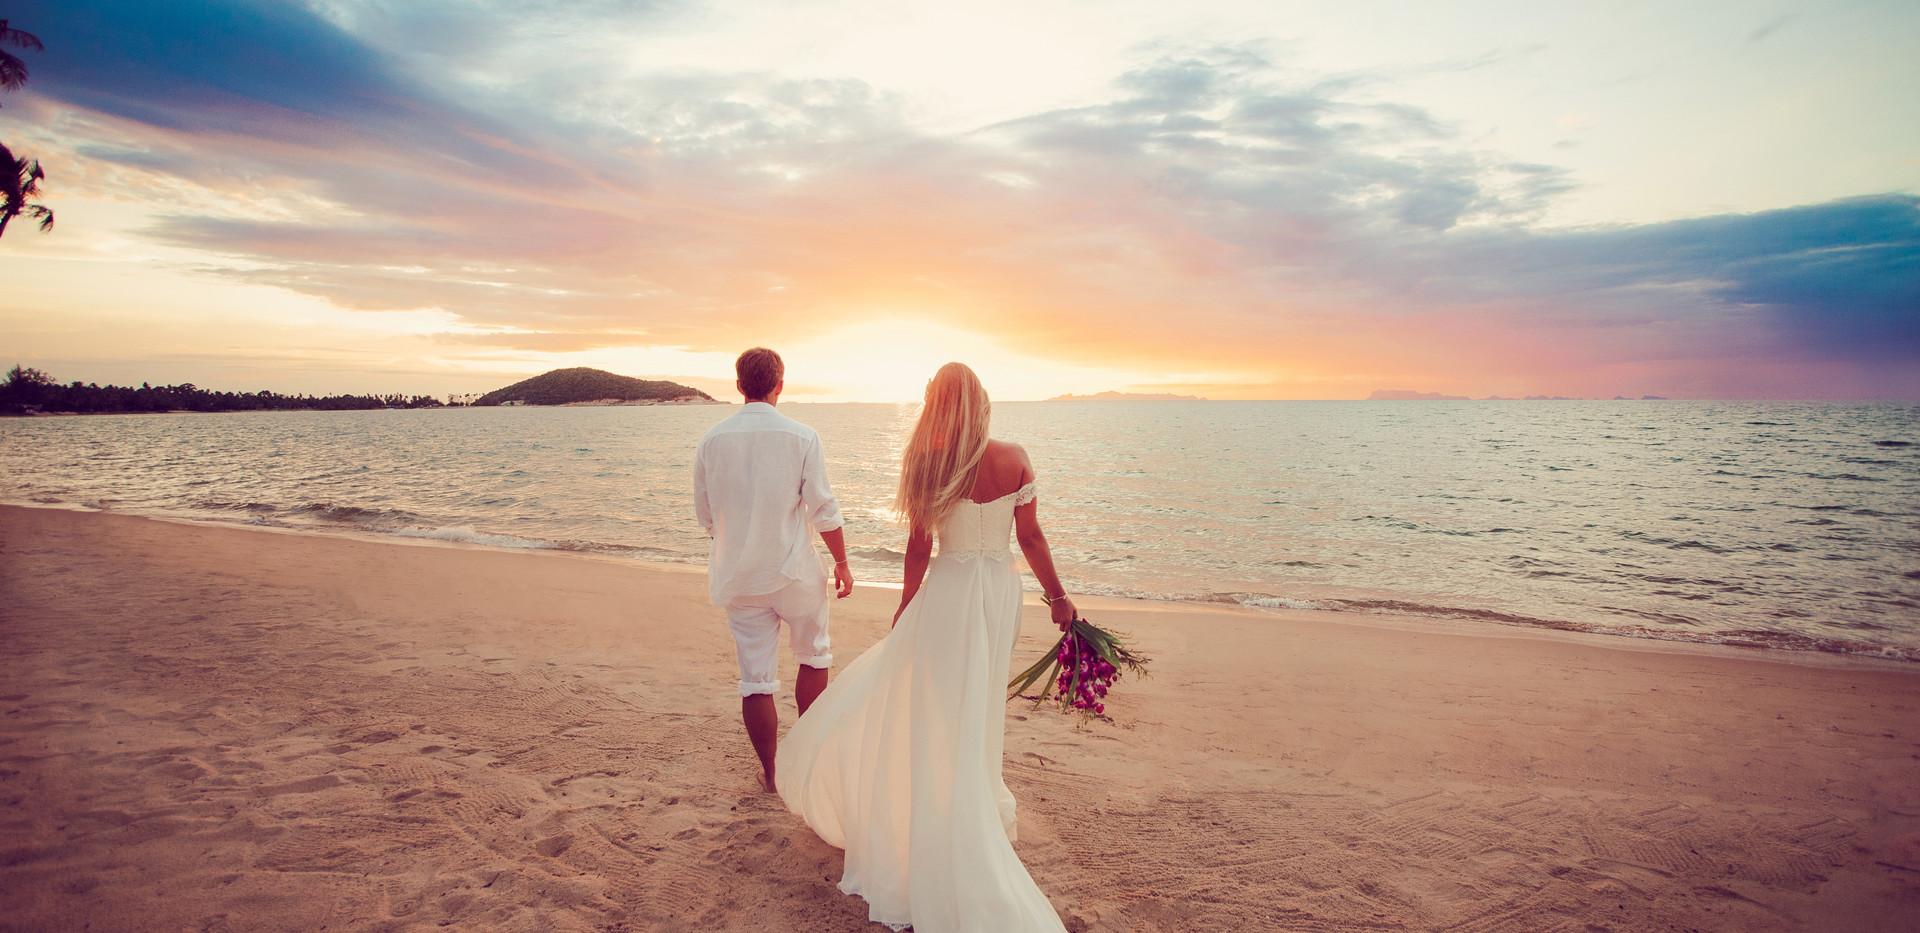 Wedding DJ Service in Carolina Beach NC offering an affordable wedding dj.